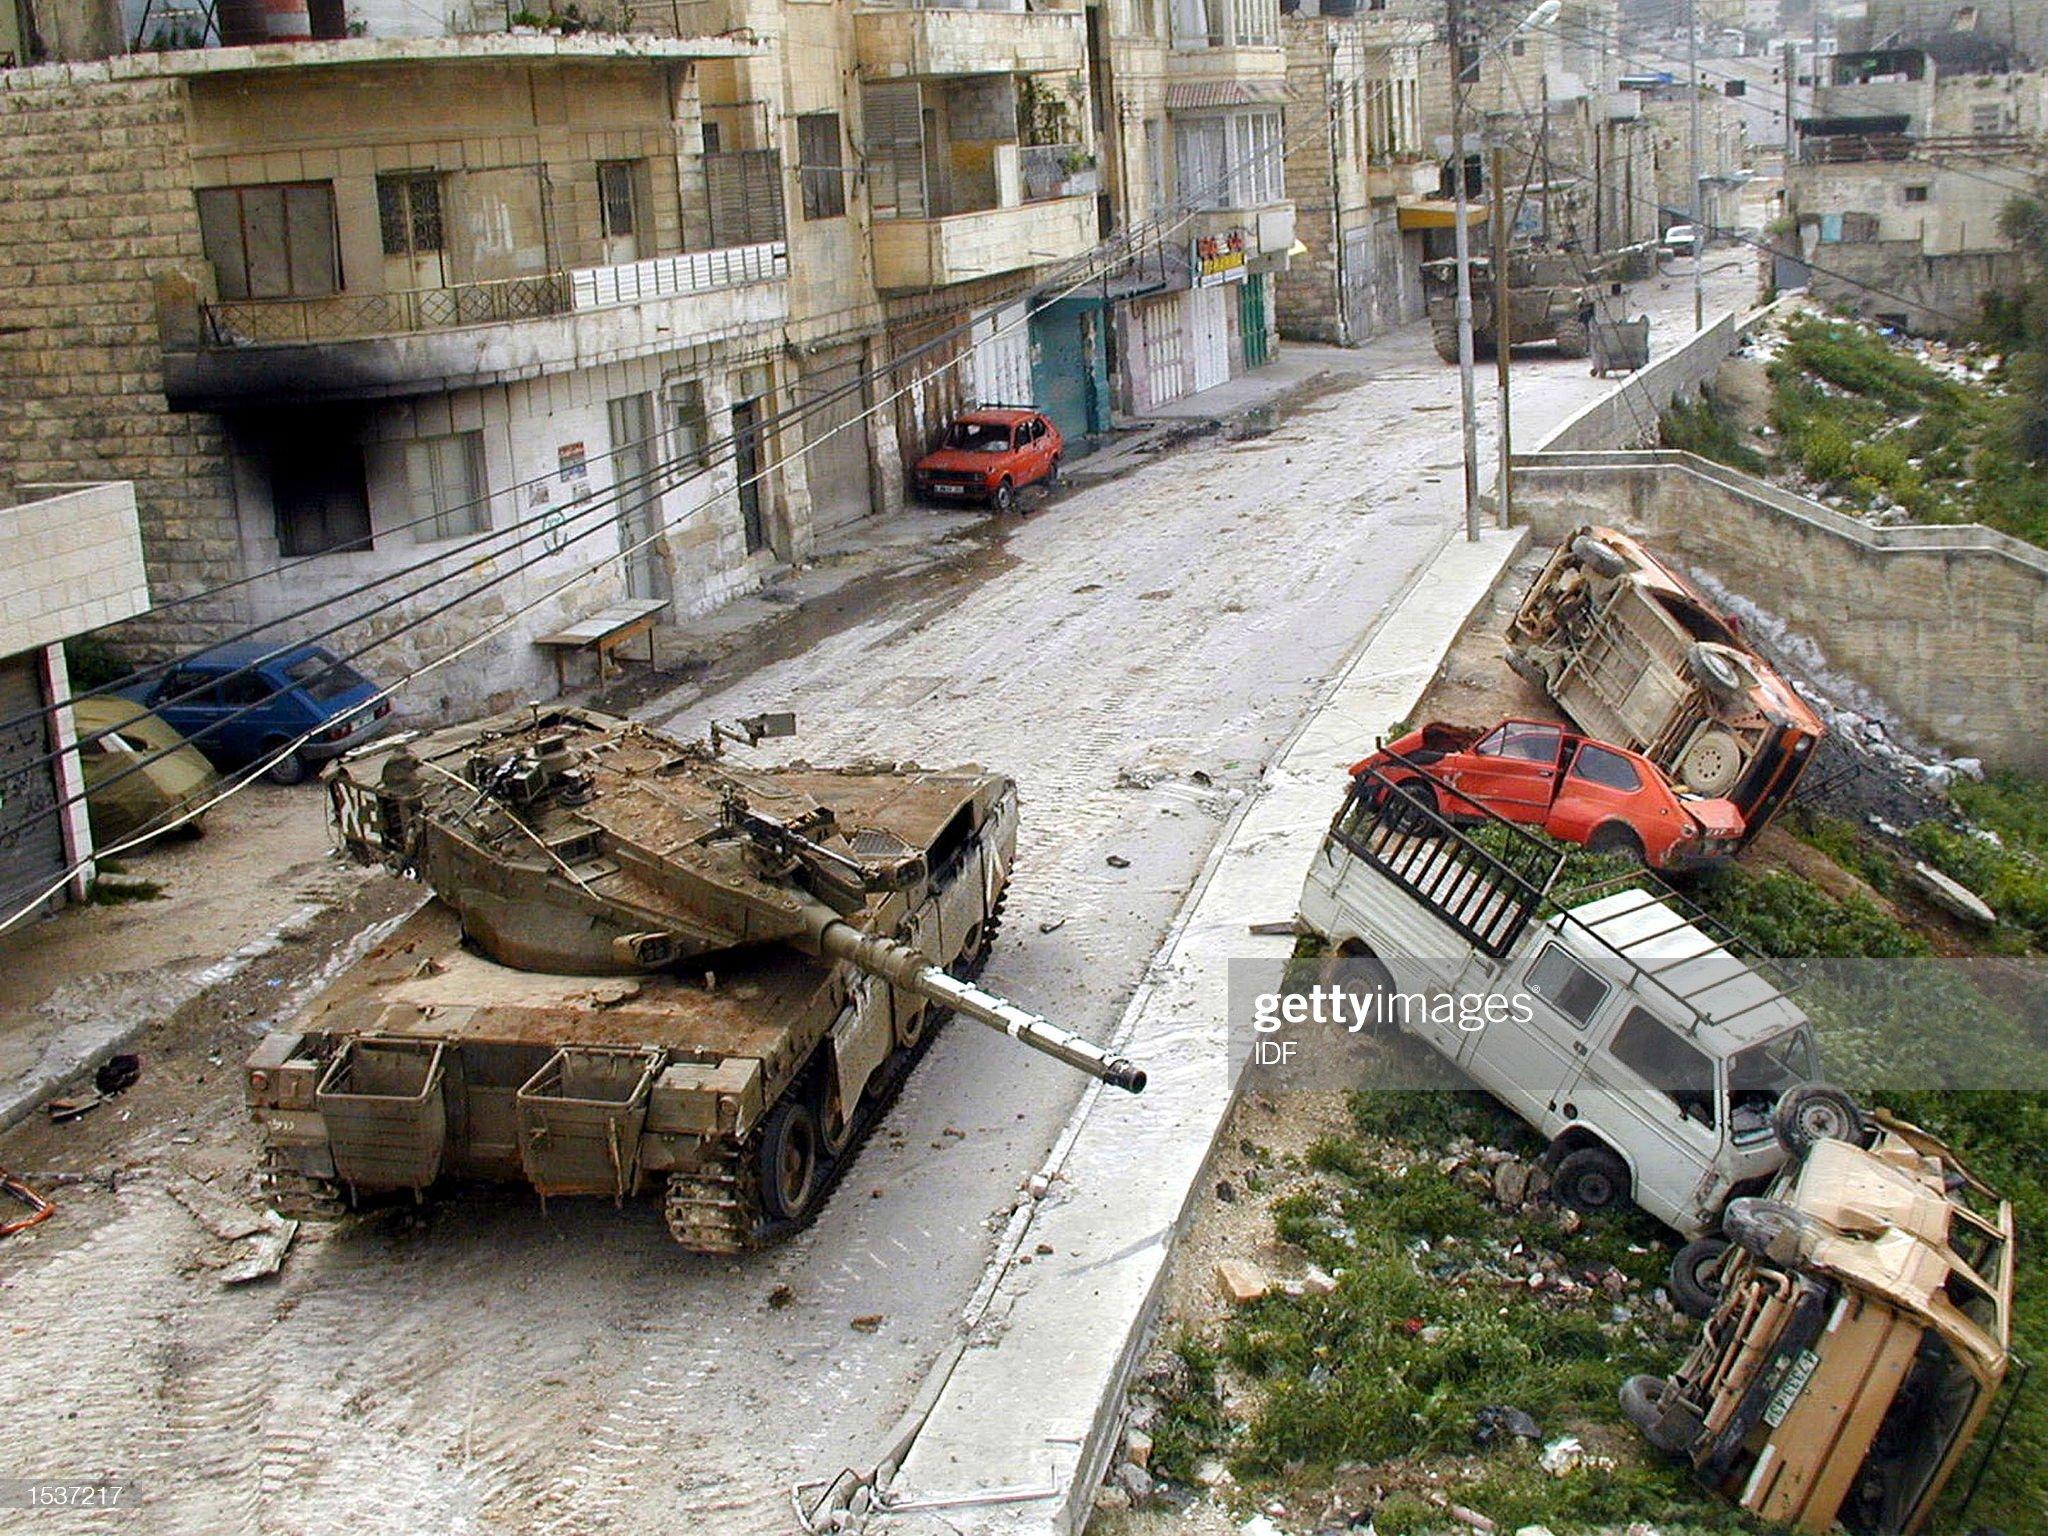 https://media.gettyimages.com/photos/an-israeli-merkava-tank-patrols-the-west-bank-town-of-jenin-april-9-picture-id1537217?s=2048x2048